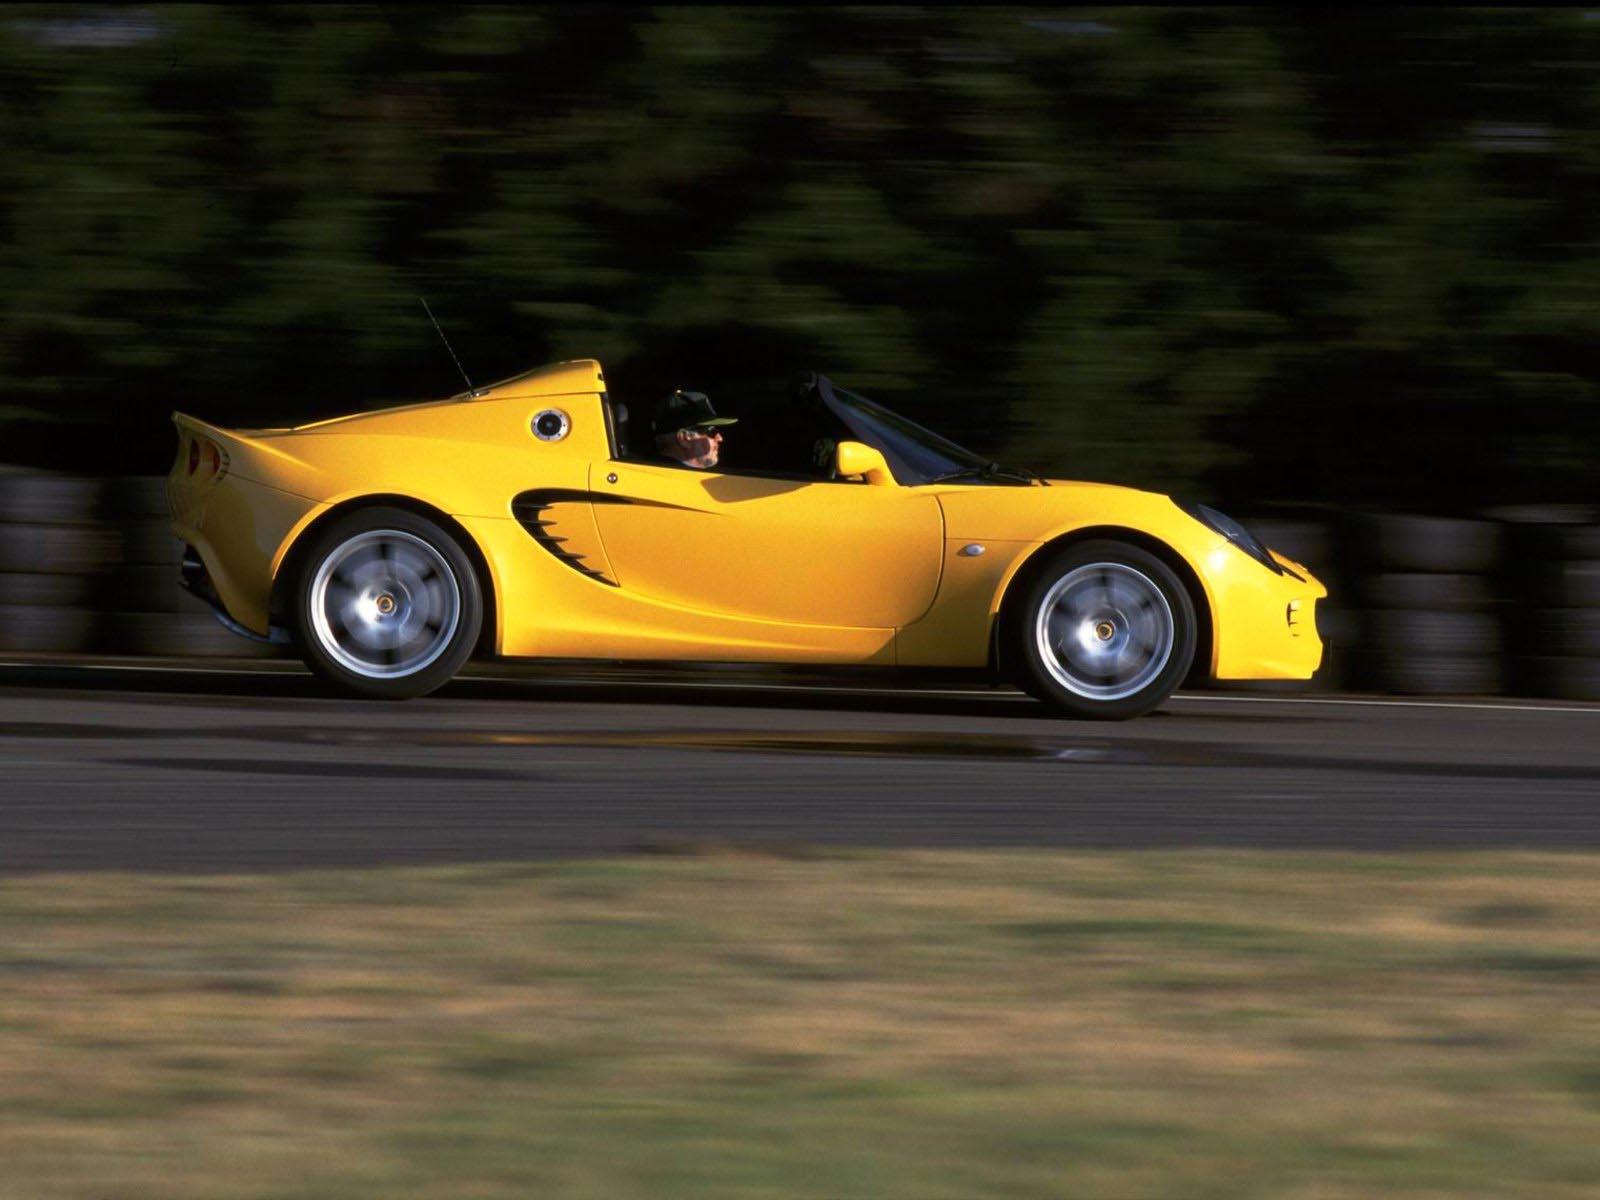 https://www.conceptcarz.com/images/Lotus/2005_lotus_elise_yellow_concept_02.jpg